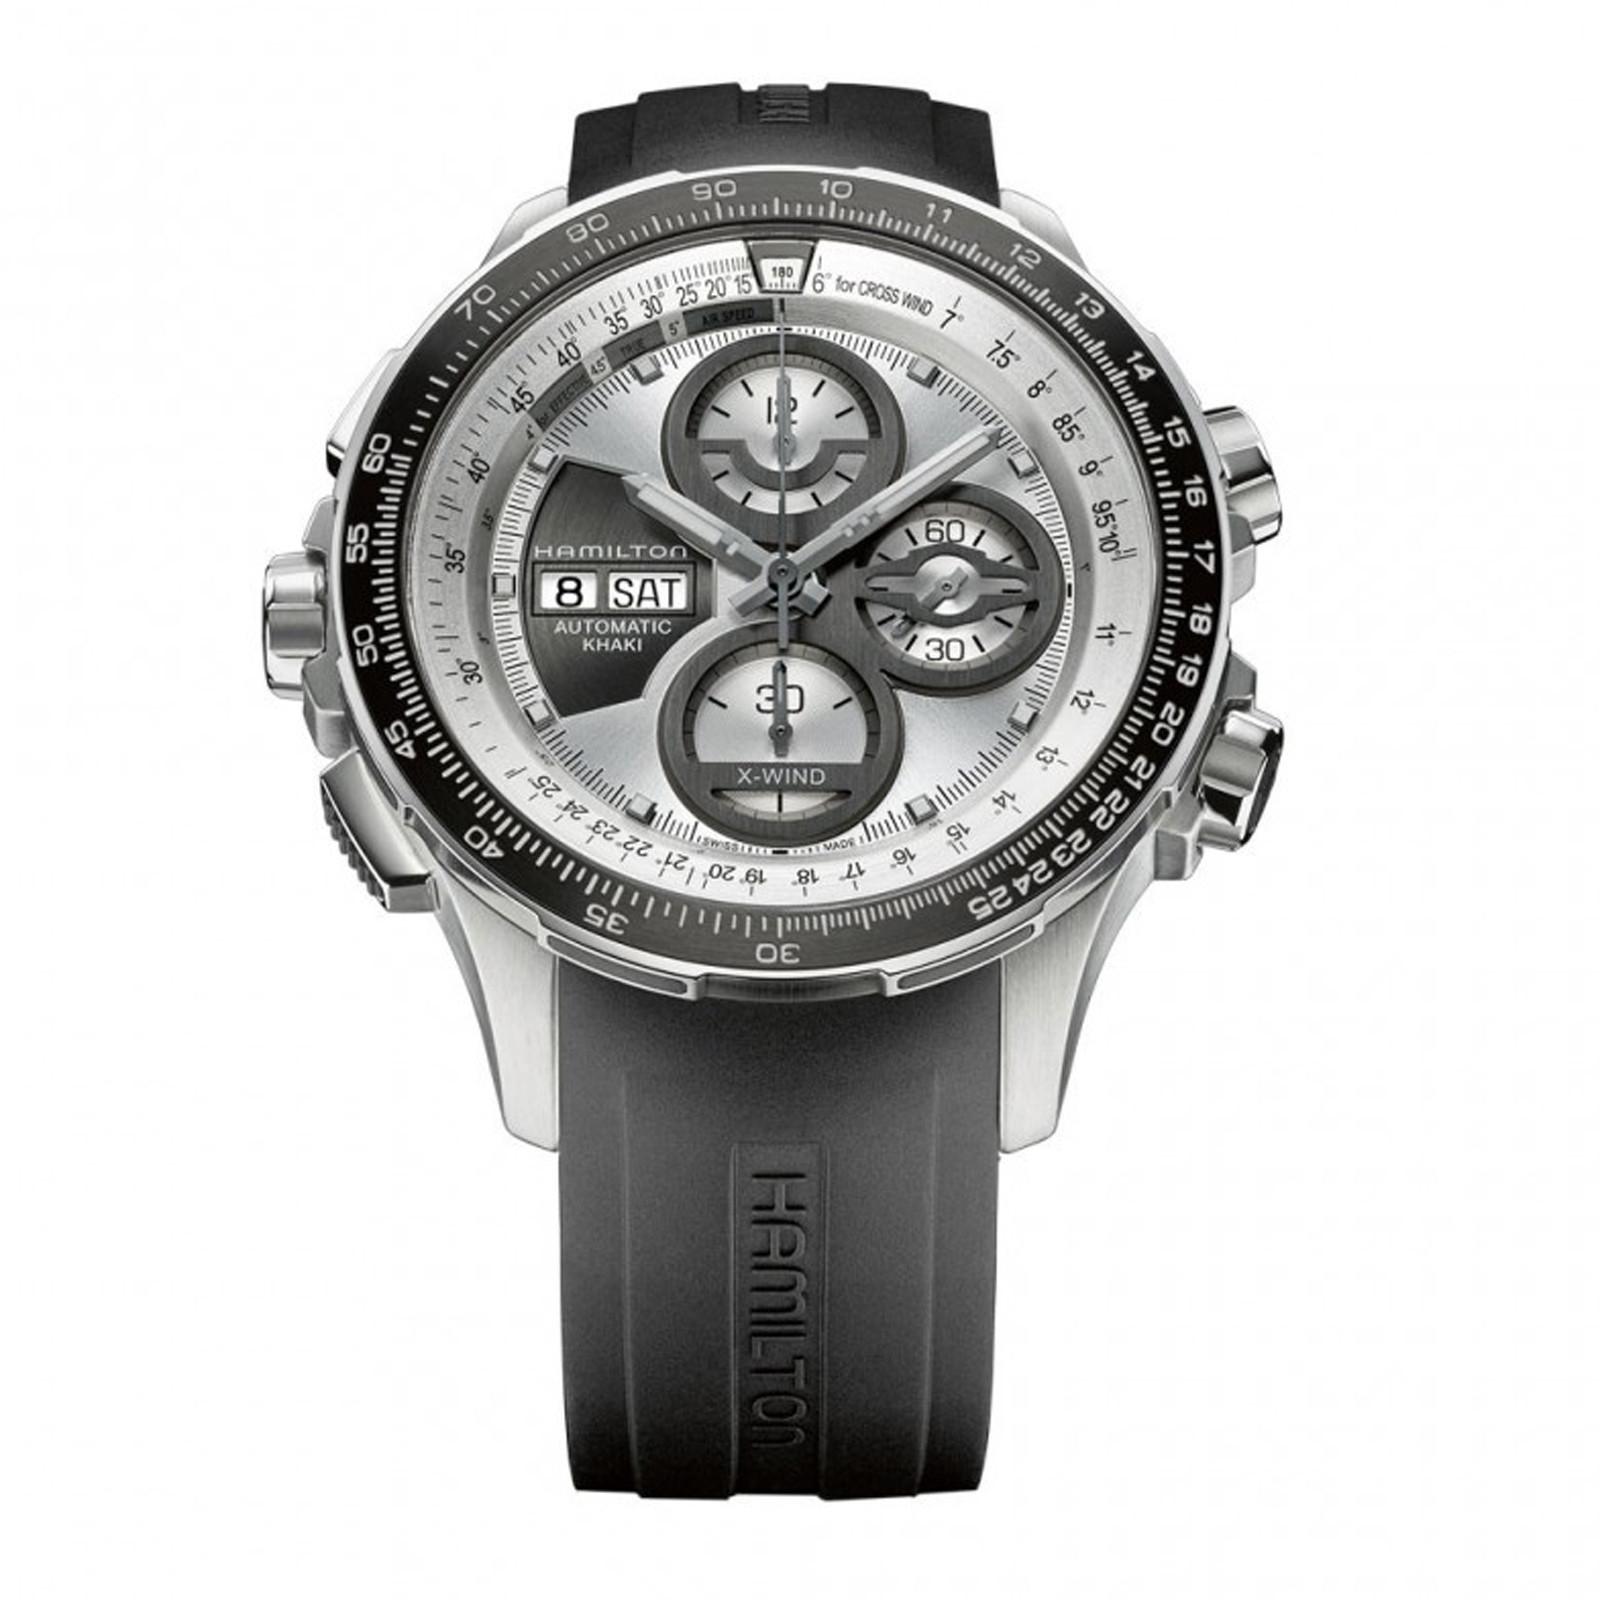 New Men's Hamilton Limited Edition X-Wind Khaki Chronograph